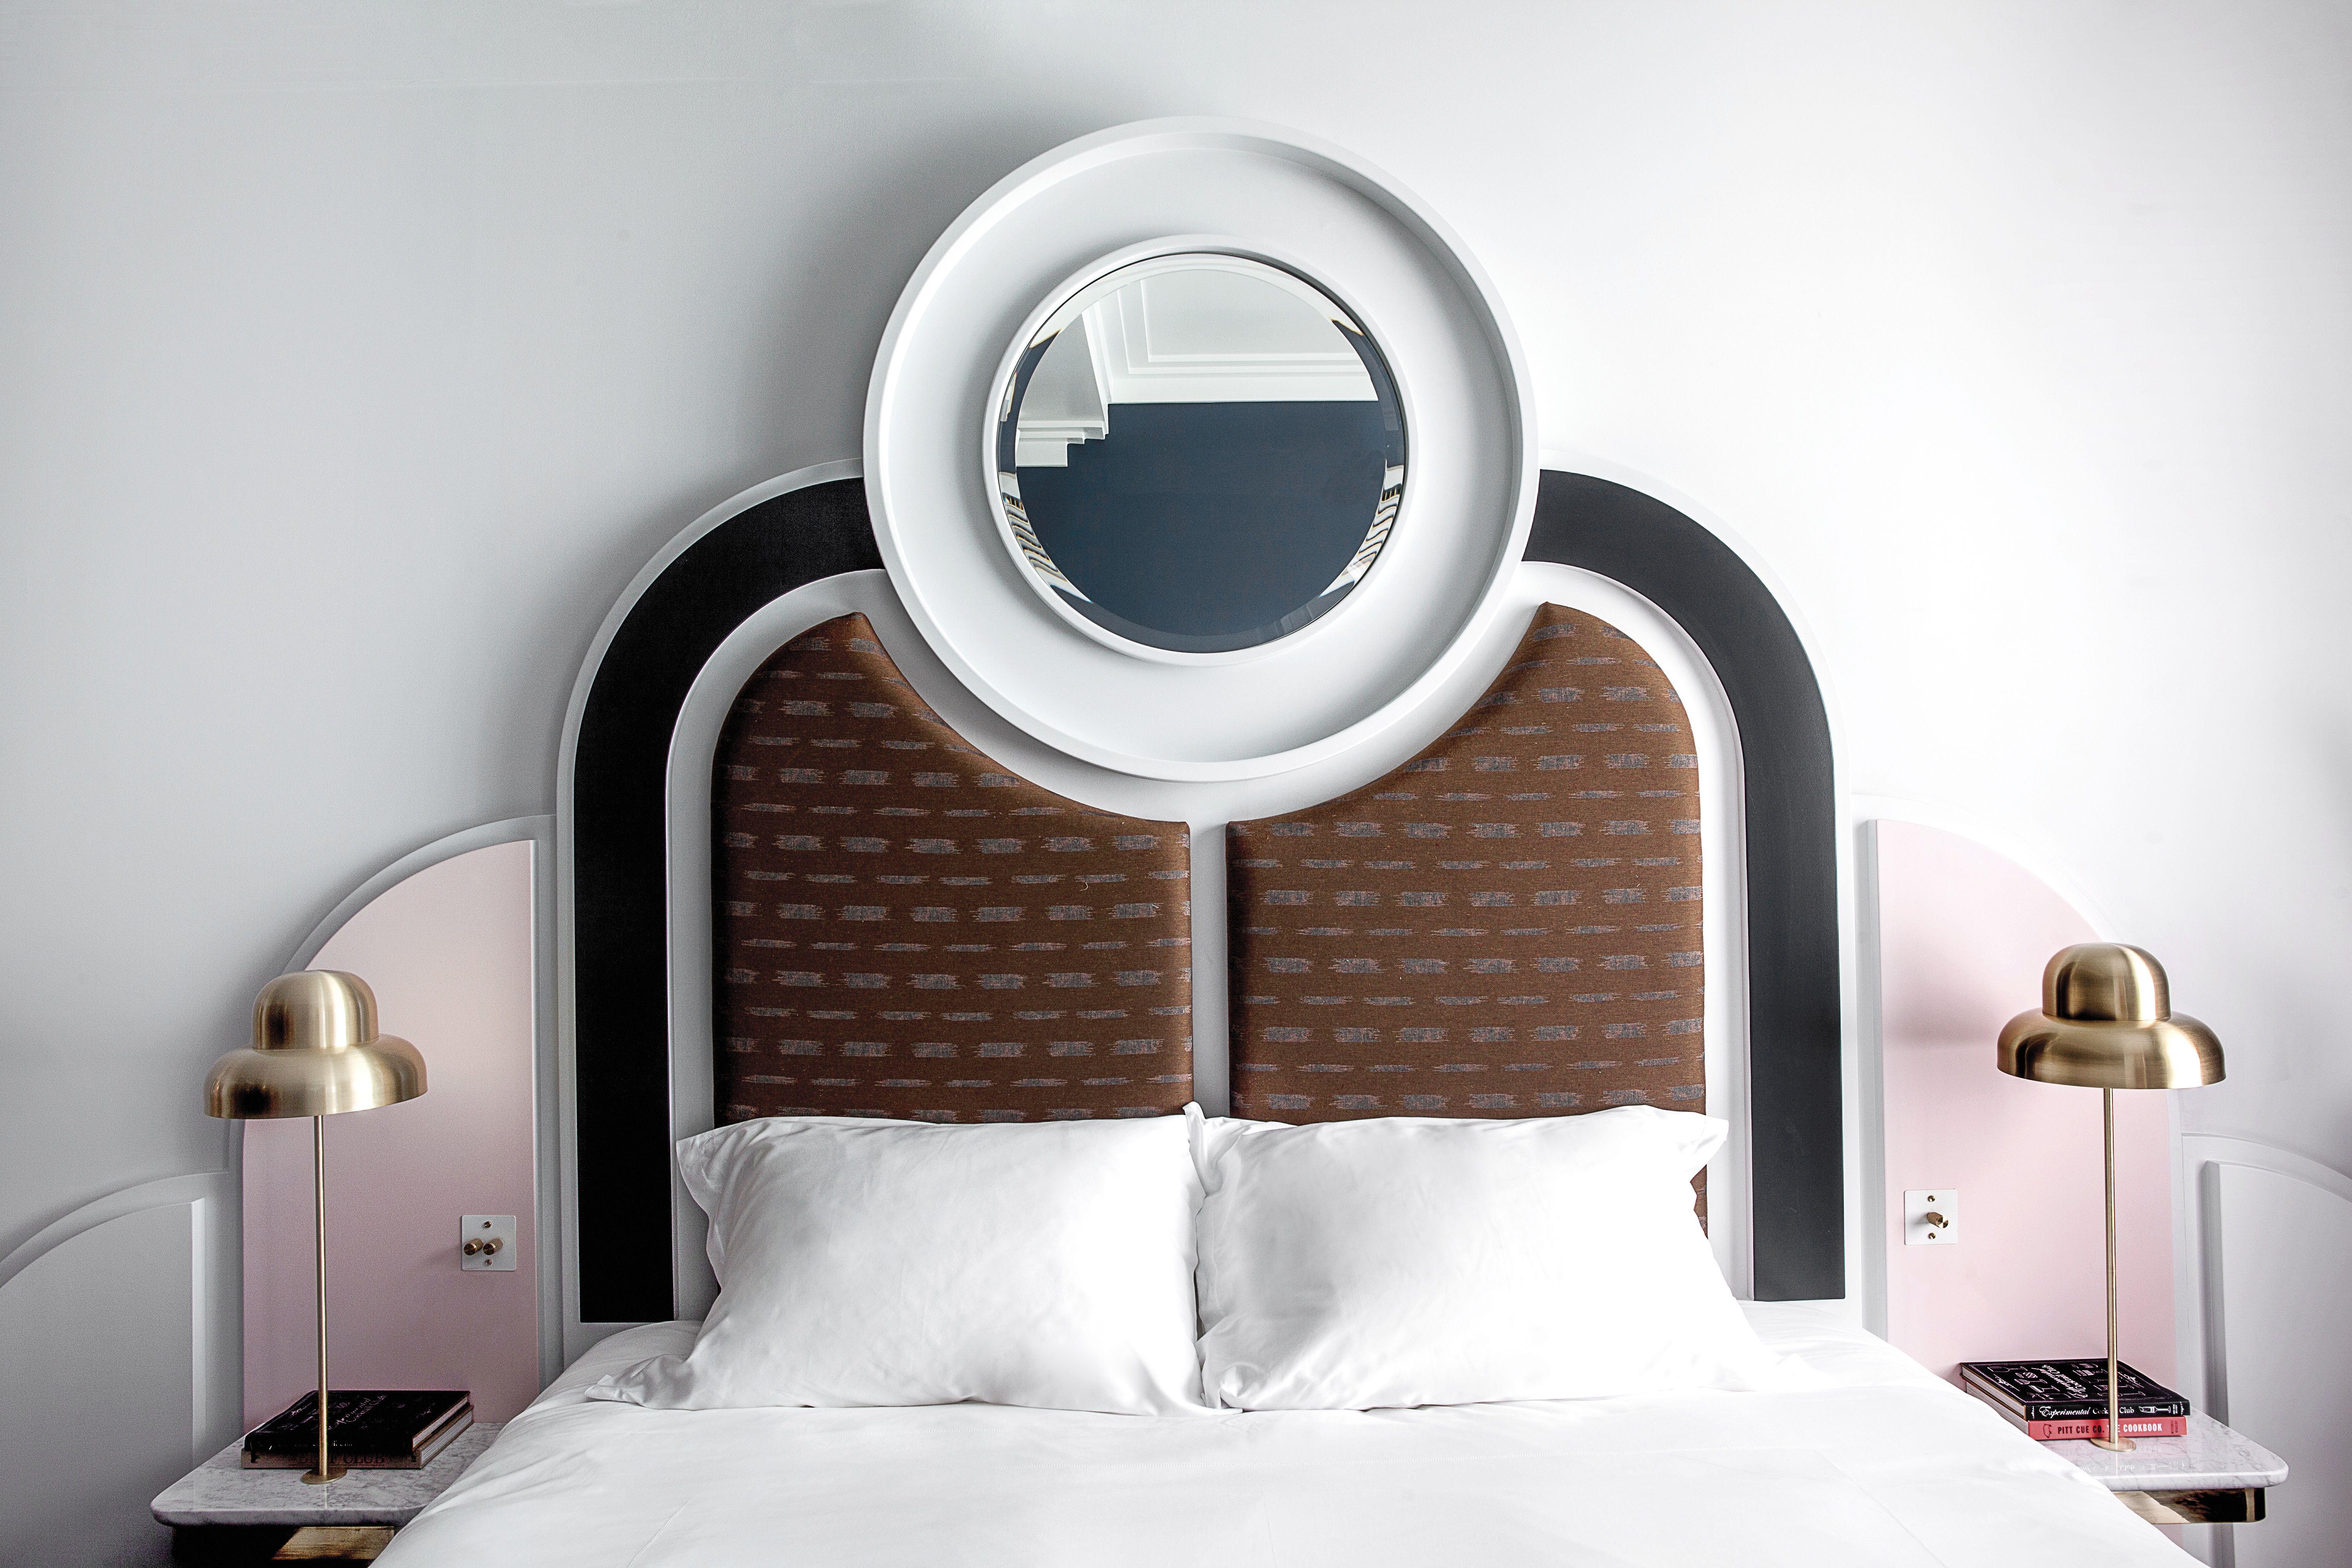 henrietta hotel london new covent garden boutique hotel dorothee